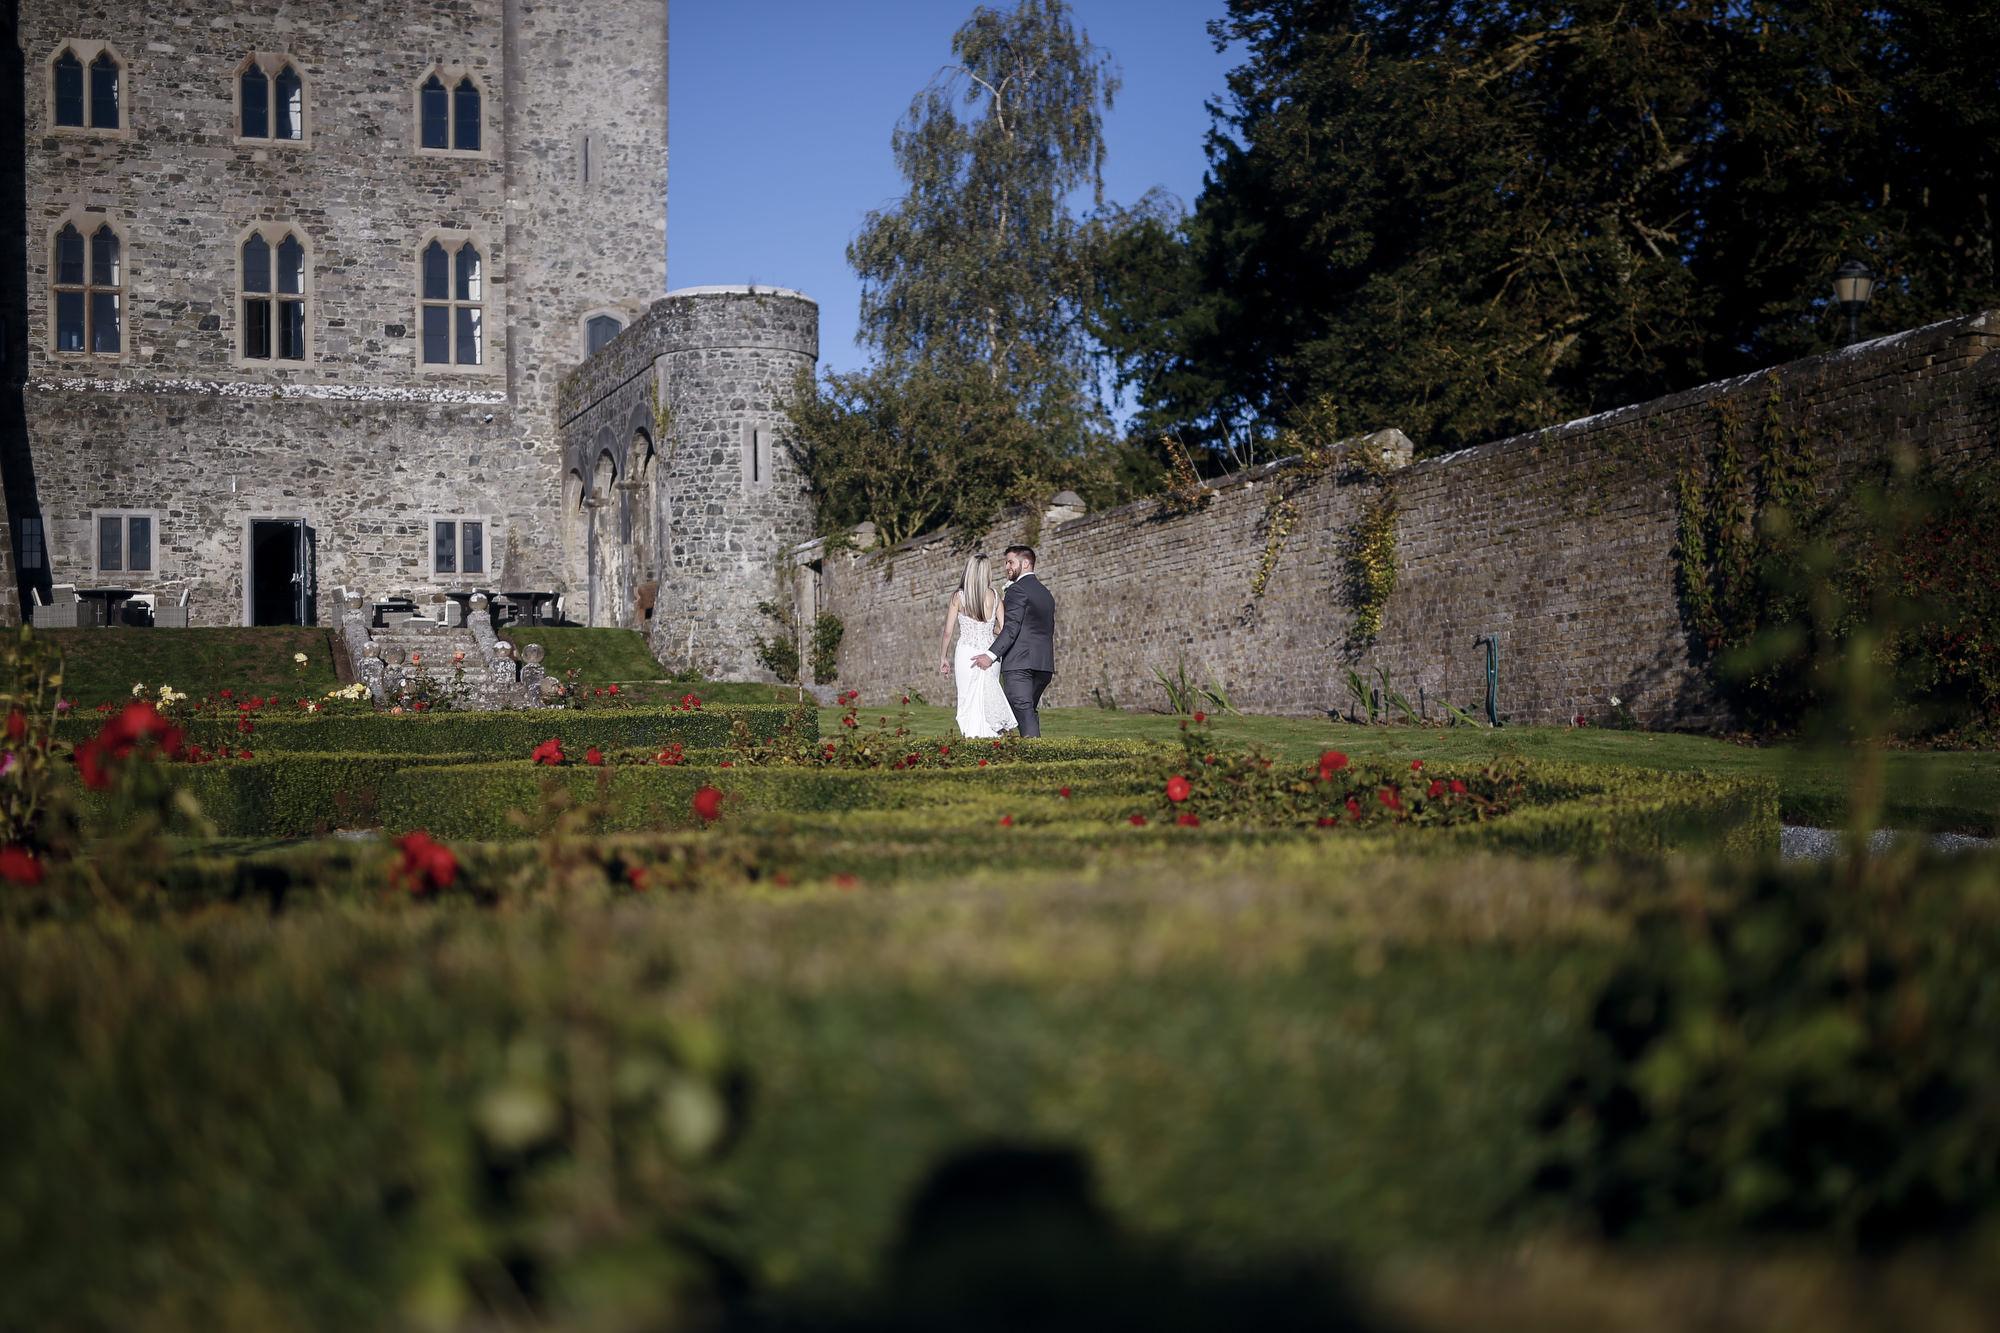 kilkea_castle_wedding_photographer_goldenmoments_053.jpg